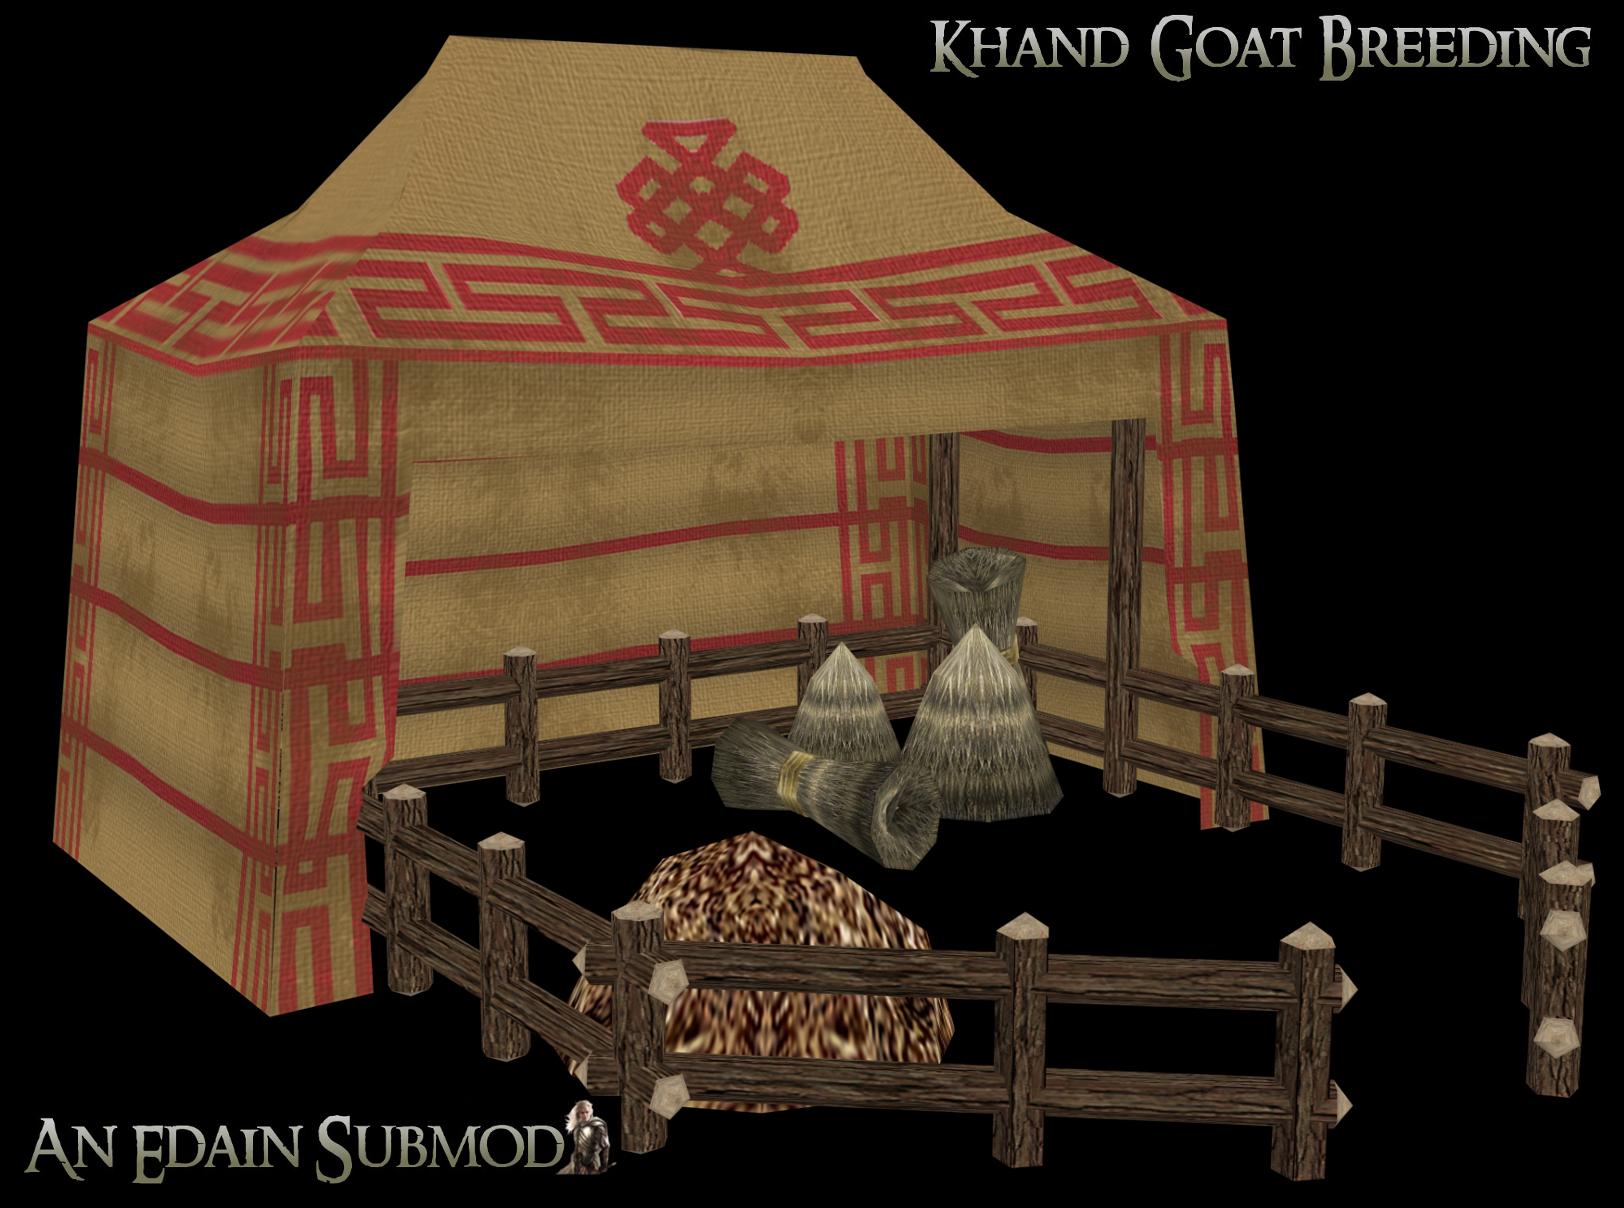 Khand Goat Breeding